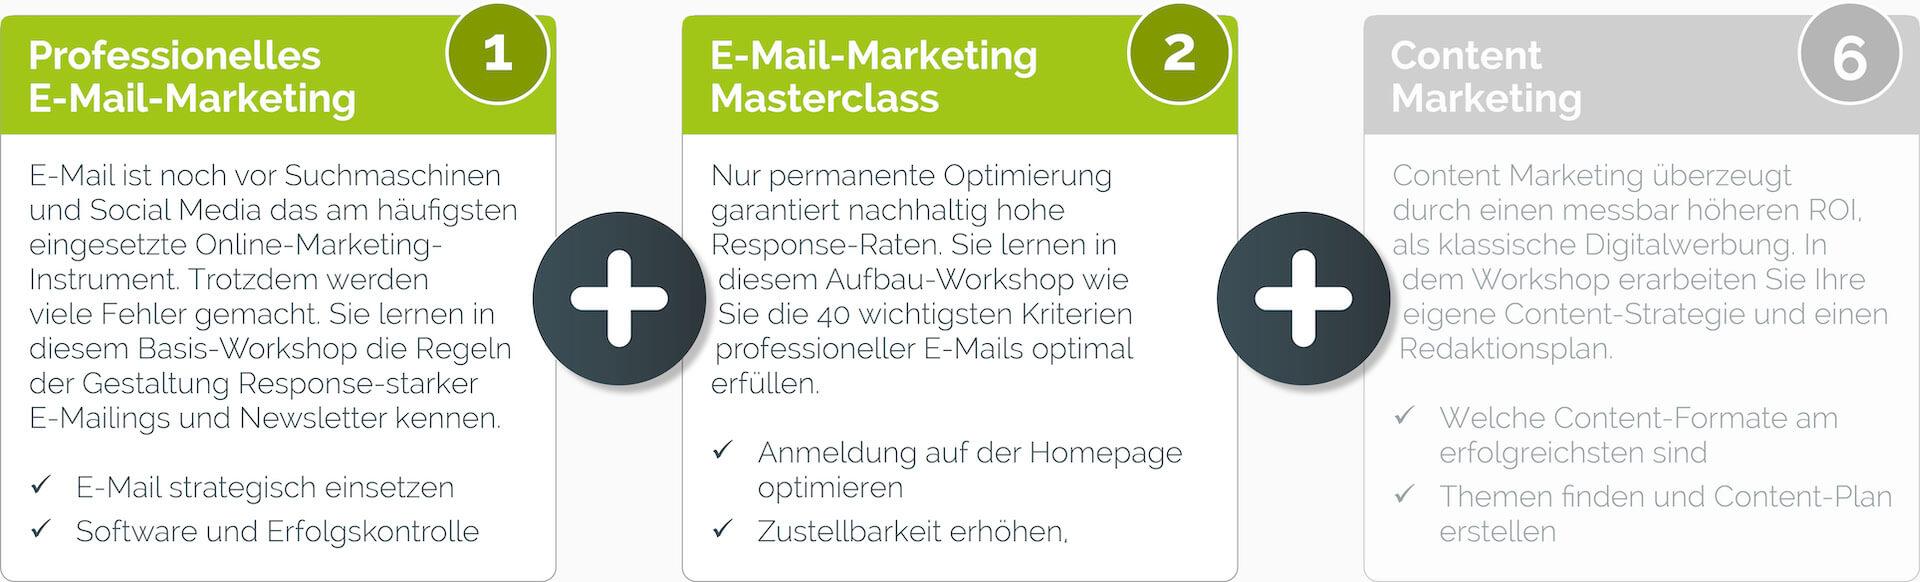 paket content marketing - Content Marketing